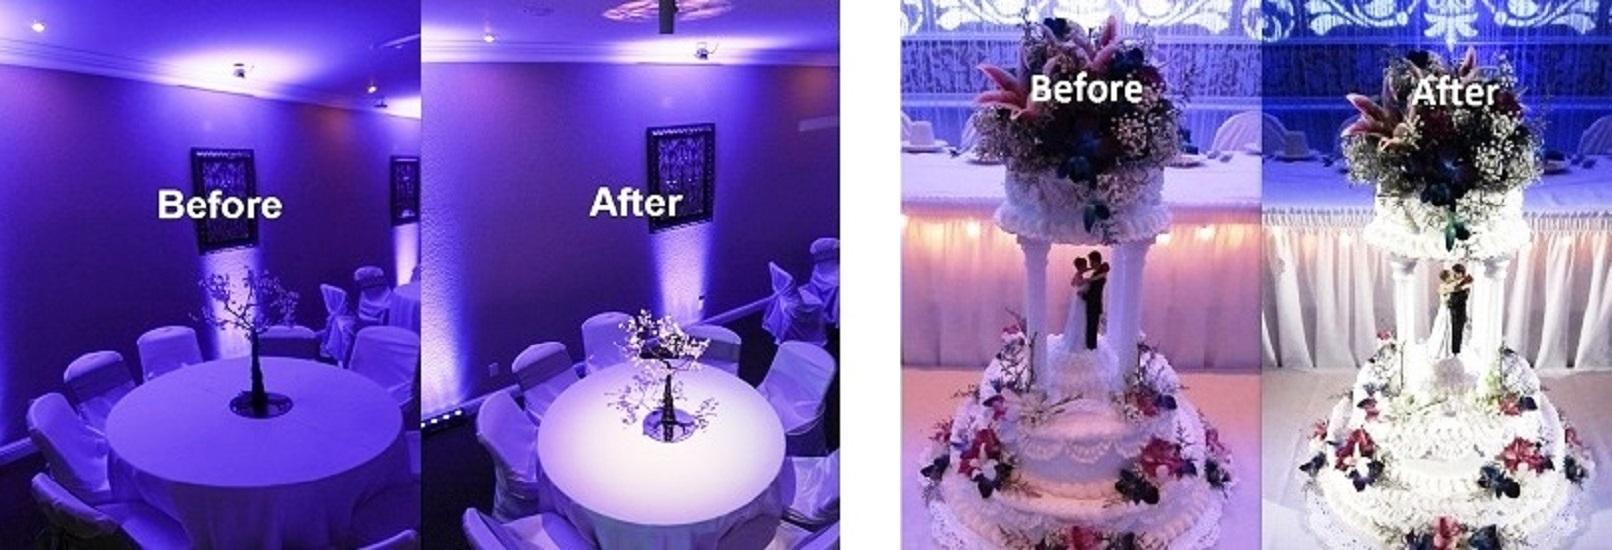 Houston Wedding DJ, DJs in Houston, Houston up lighting decor, Pin Lights, Cake Lighting, Table Lighting at a Houston Wedding or event, Houston DJ, Awesome Lighting Decor, Awesome Music Entertainment, Awesome Event Pros, AME DJs, Sonido DJ Sammy De Houston